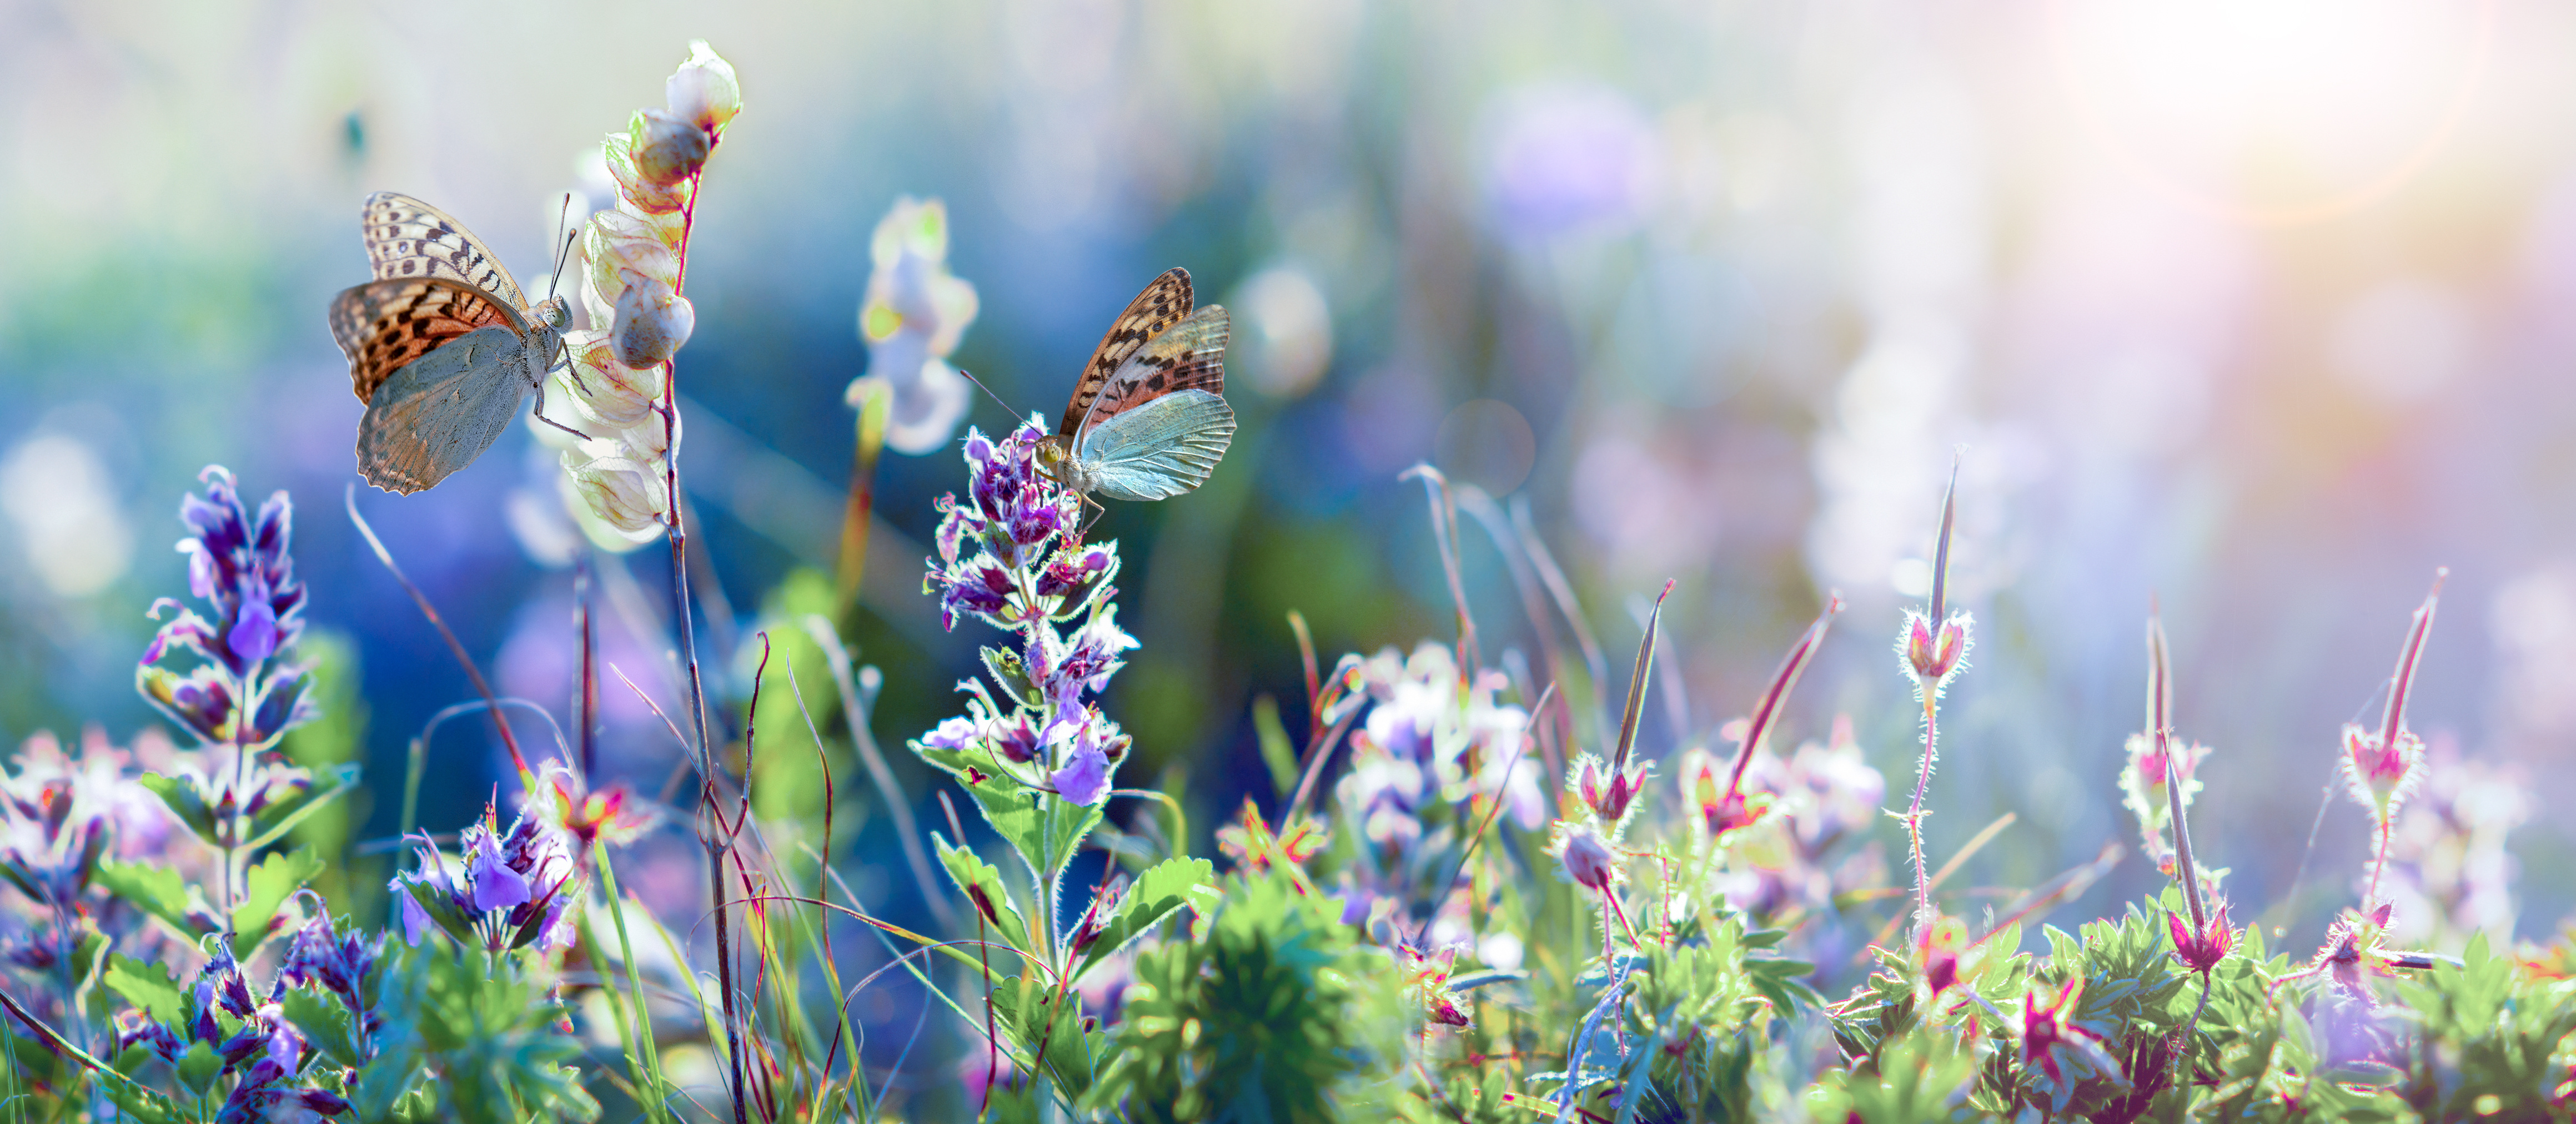 A wildflower meadow with butterflies.